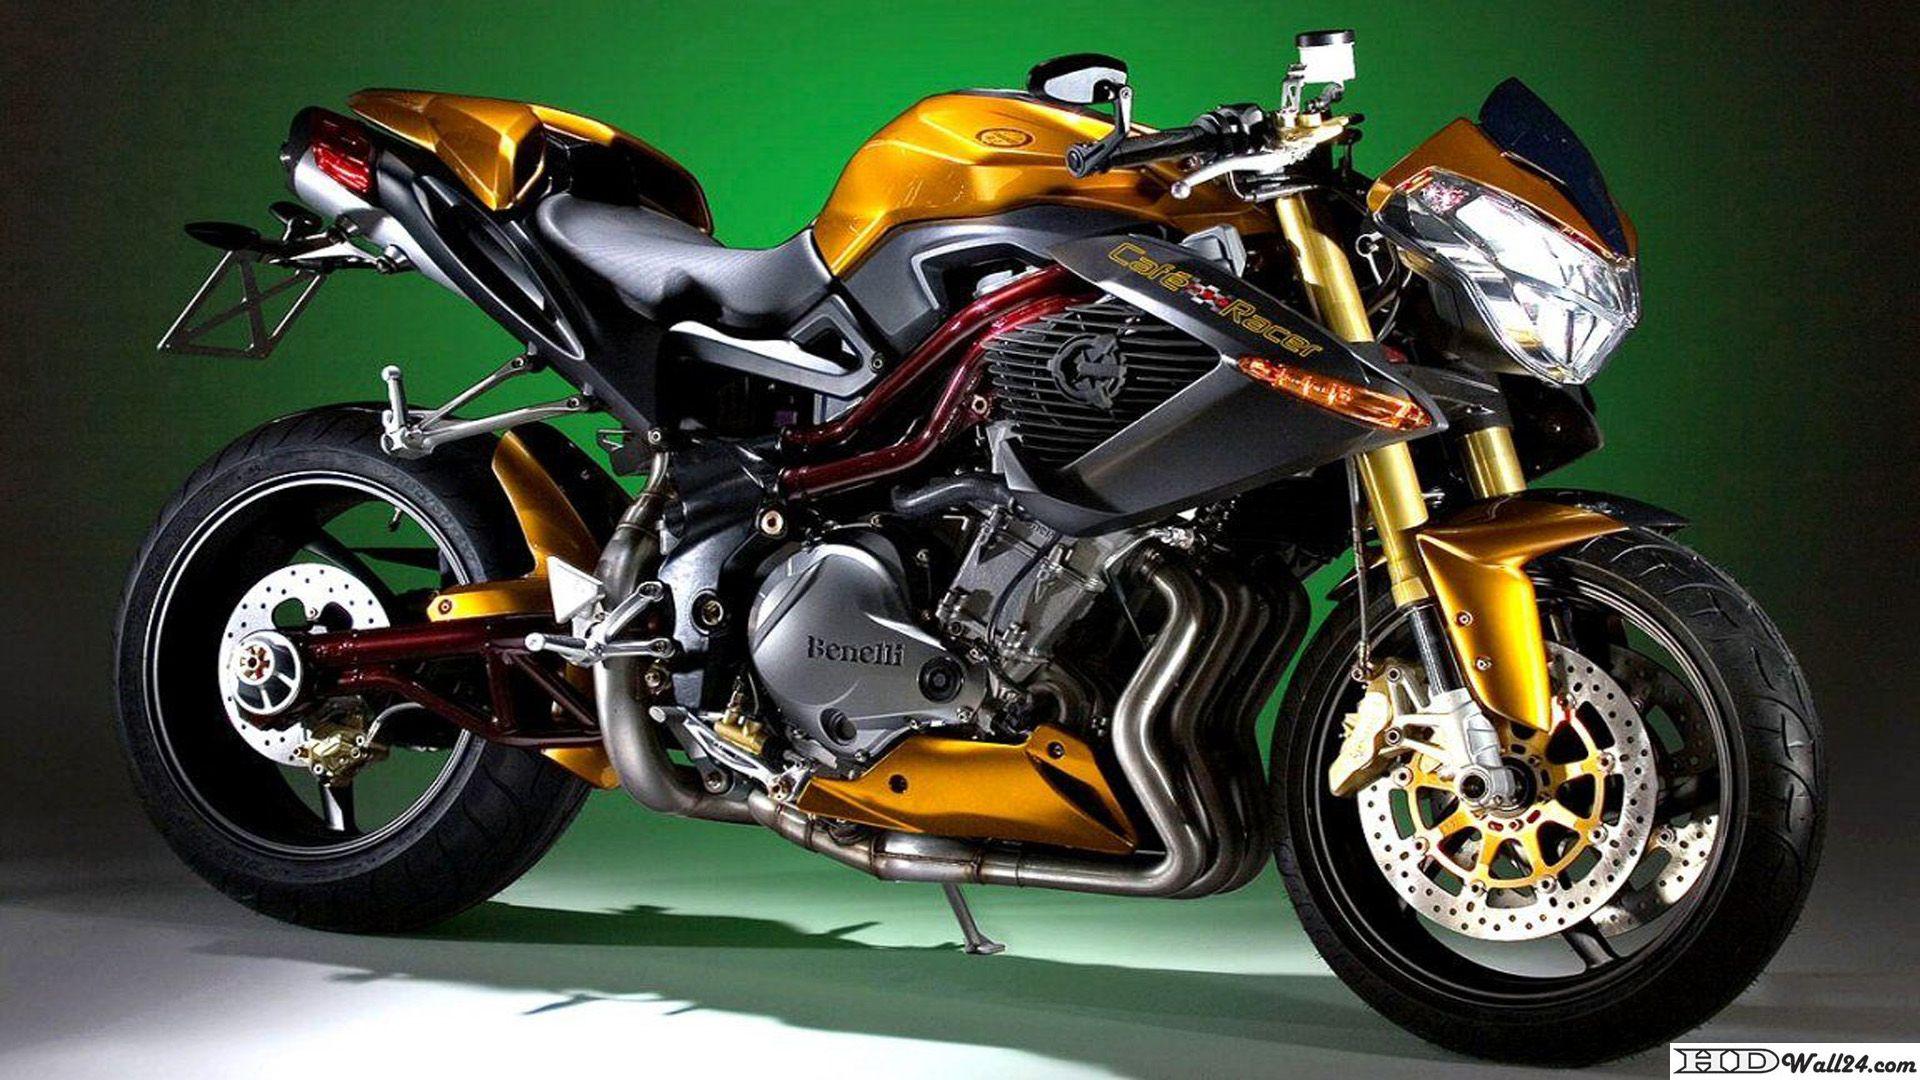 Benelli Motor Bike Wallpapers